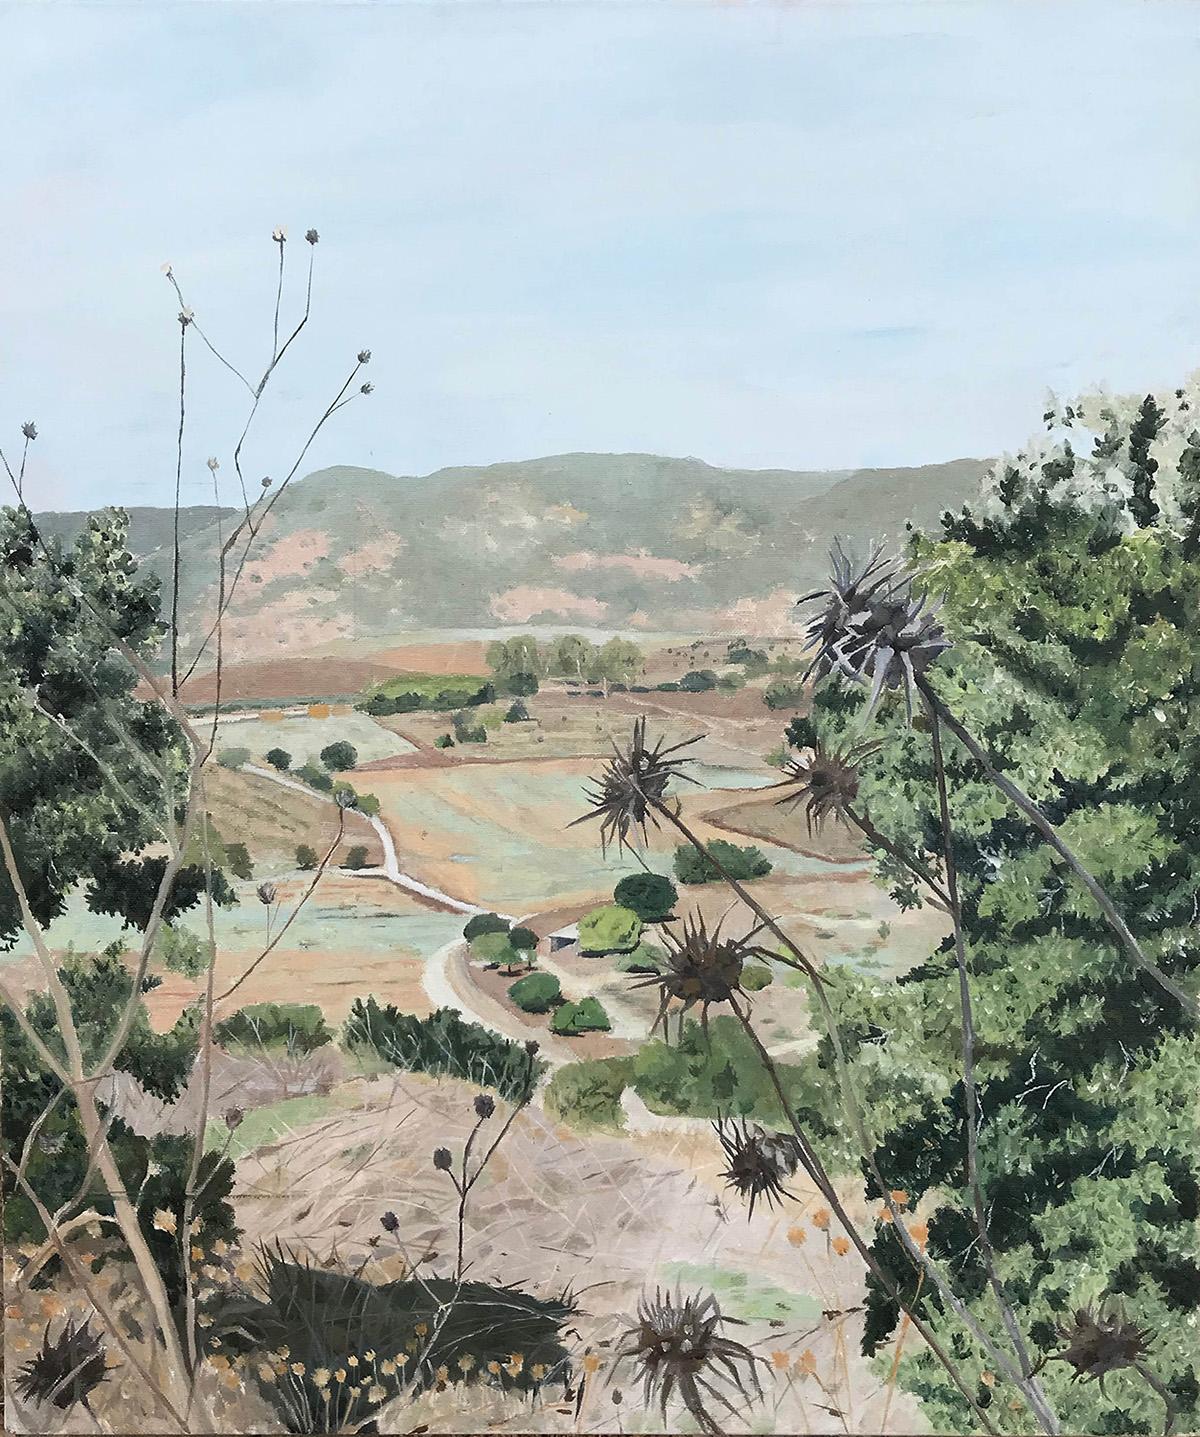 Mount Carmel IV. Zohar Flax. Jackson's Painting Prize.